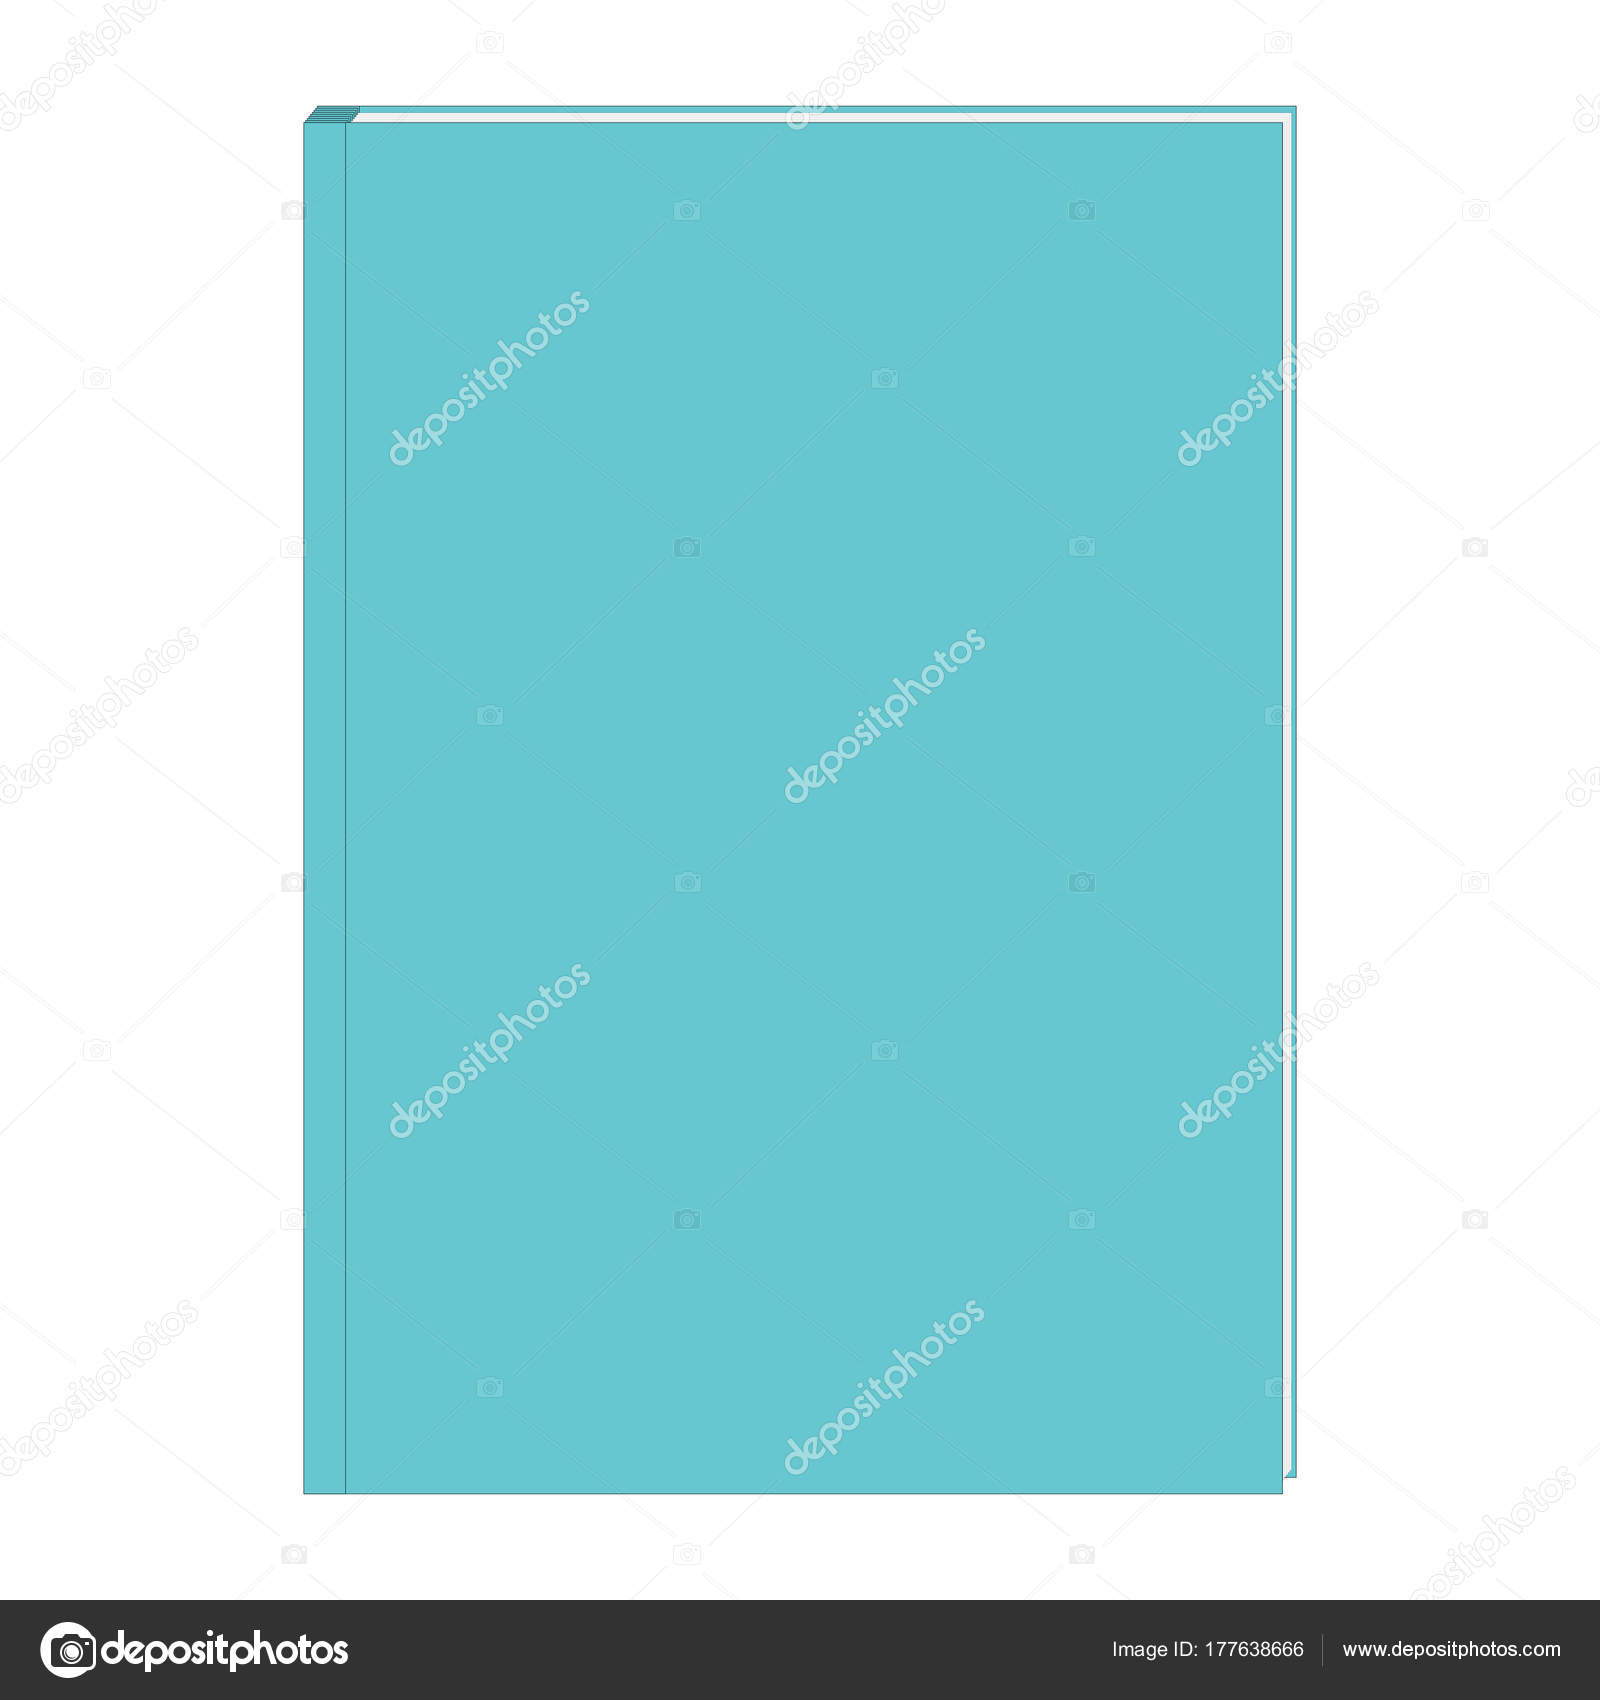 Buch Cover Vorlage Blaue Farbe Buch — Stockvektor © Maria_ #177638666